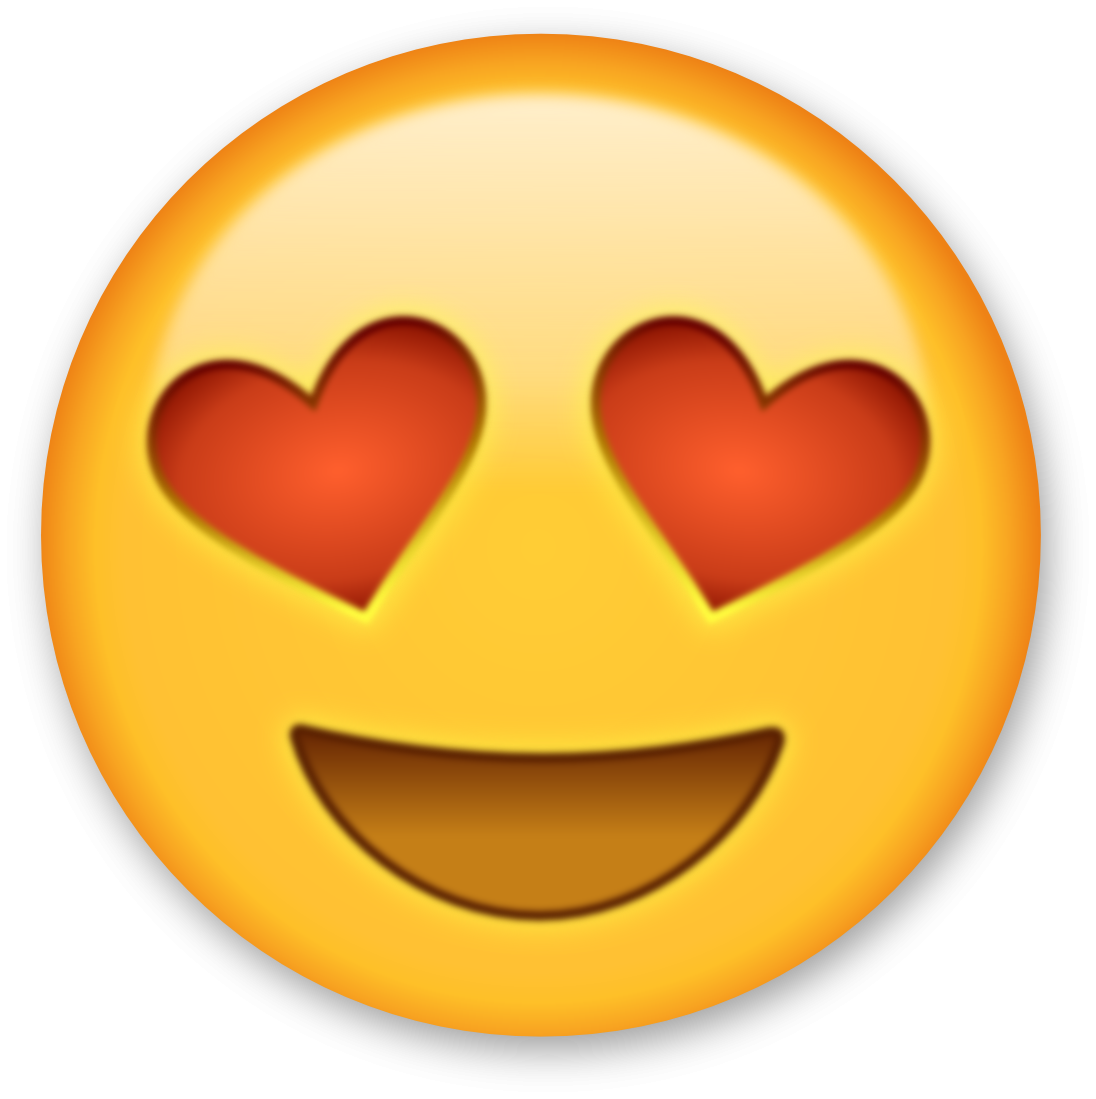 Emoji clipart iphone. Little that i put